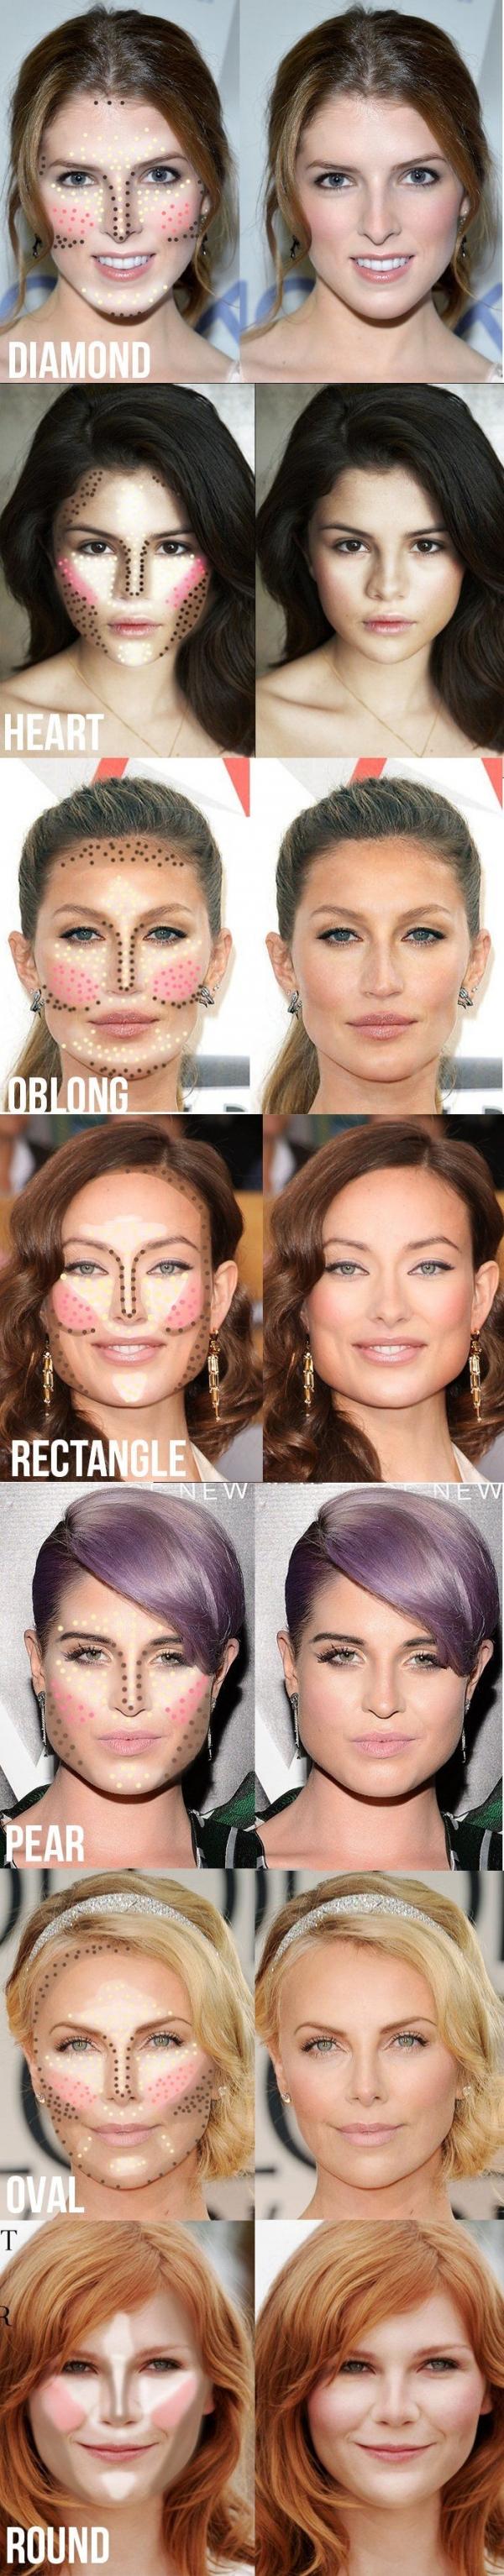 makeupandbodyblog:howtocontouryourface